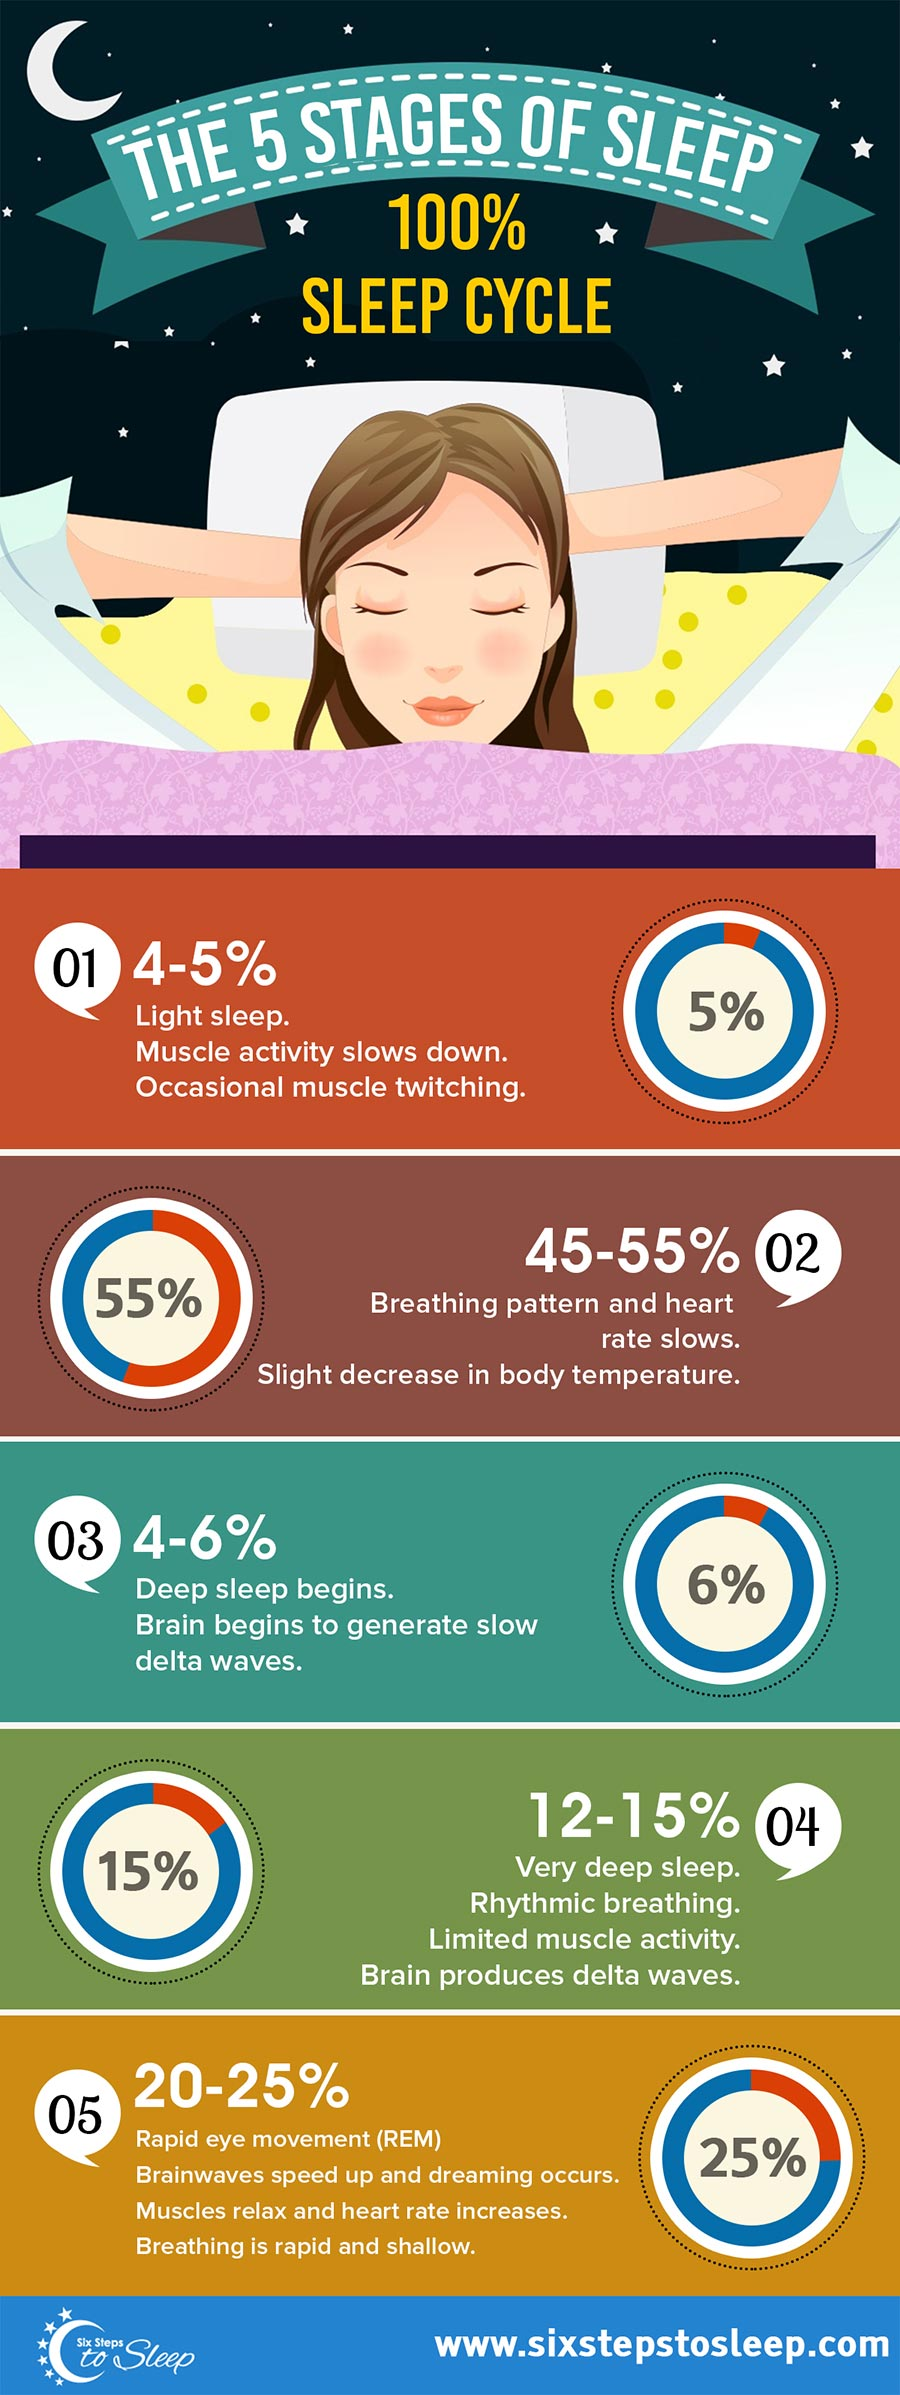 Understanding the Sleep Cycle & Stages of Sleep